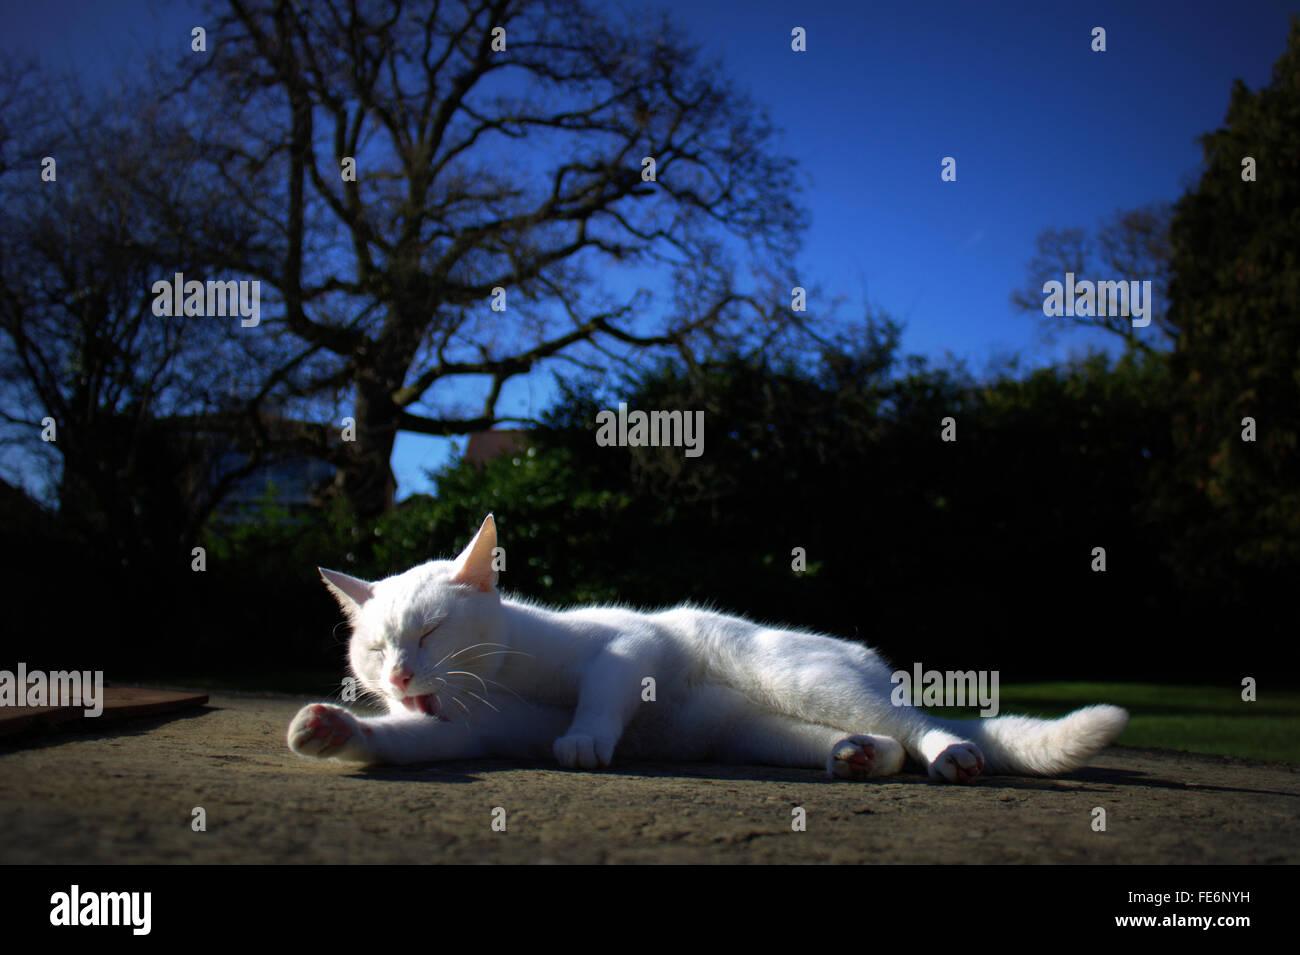 White Cat Yawning On Street At Night - Stock Image